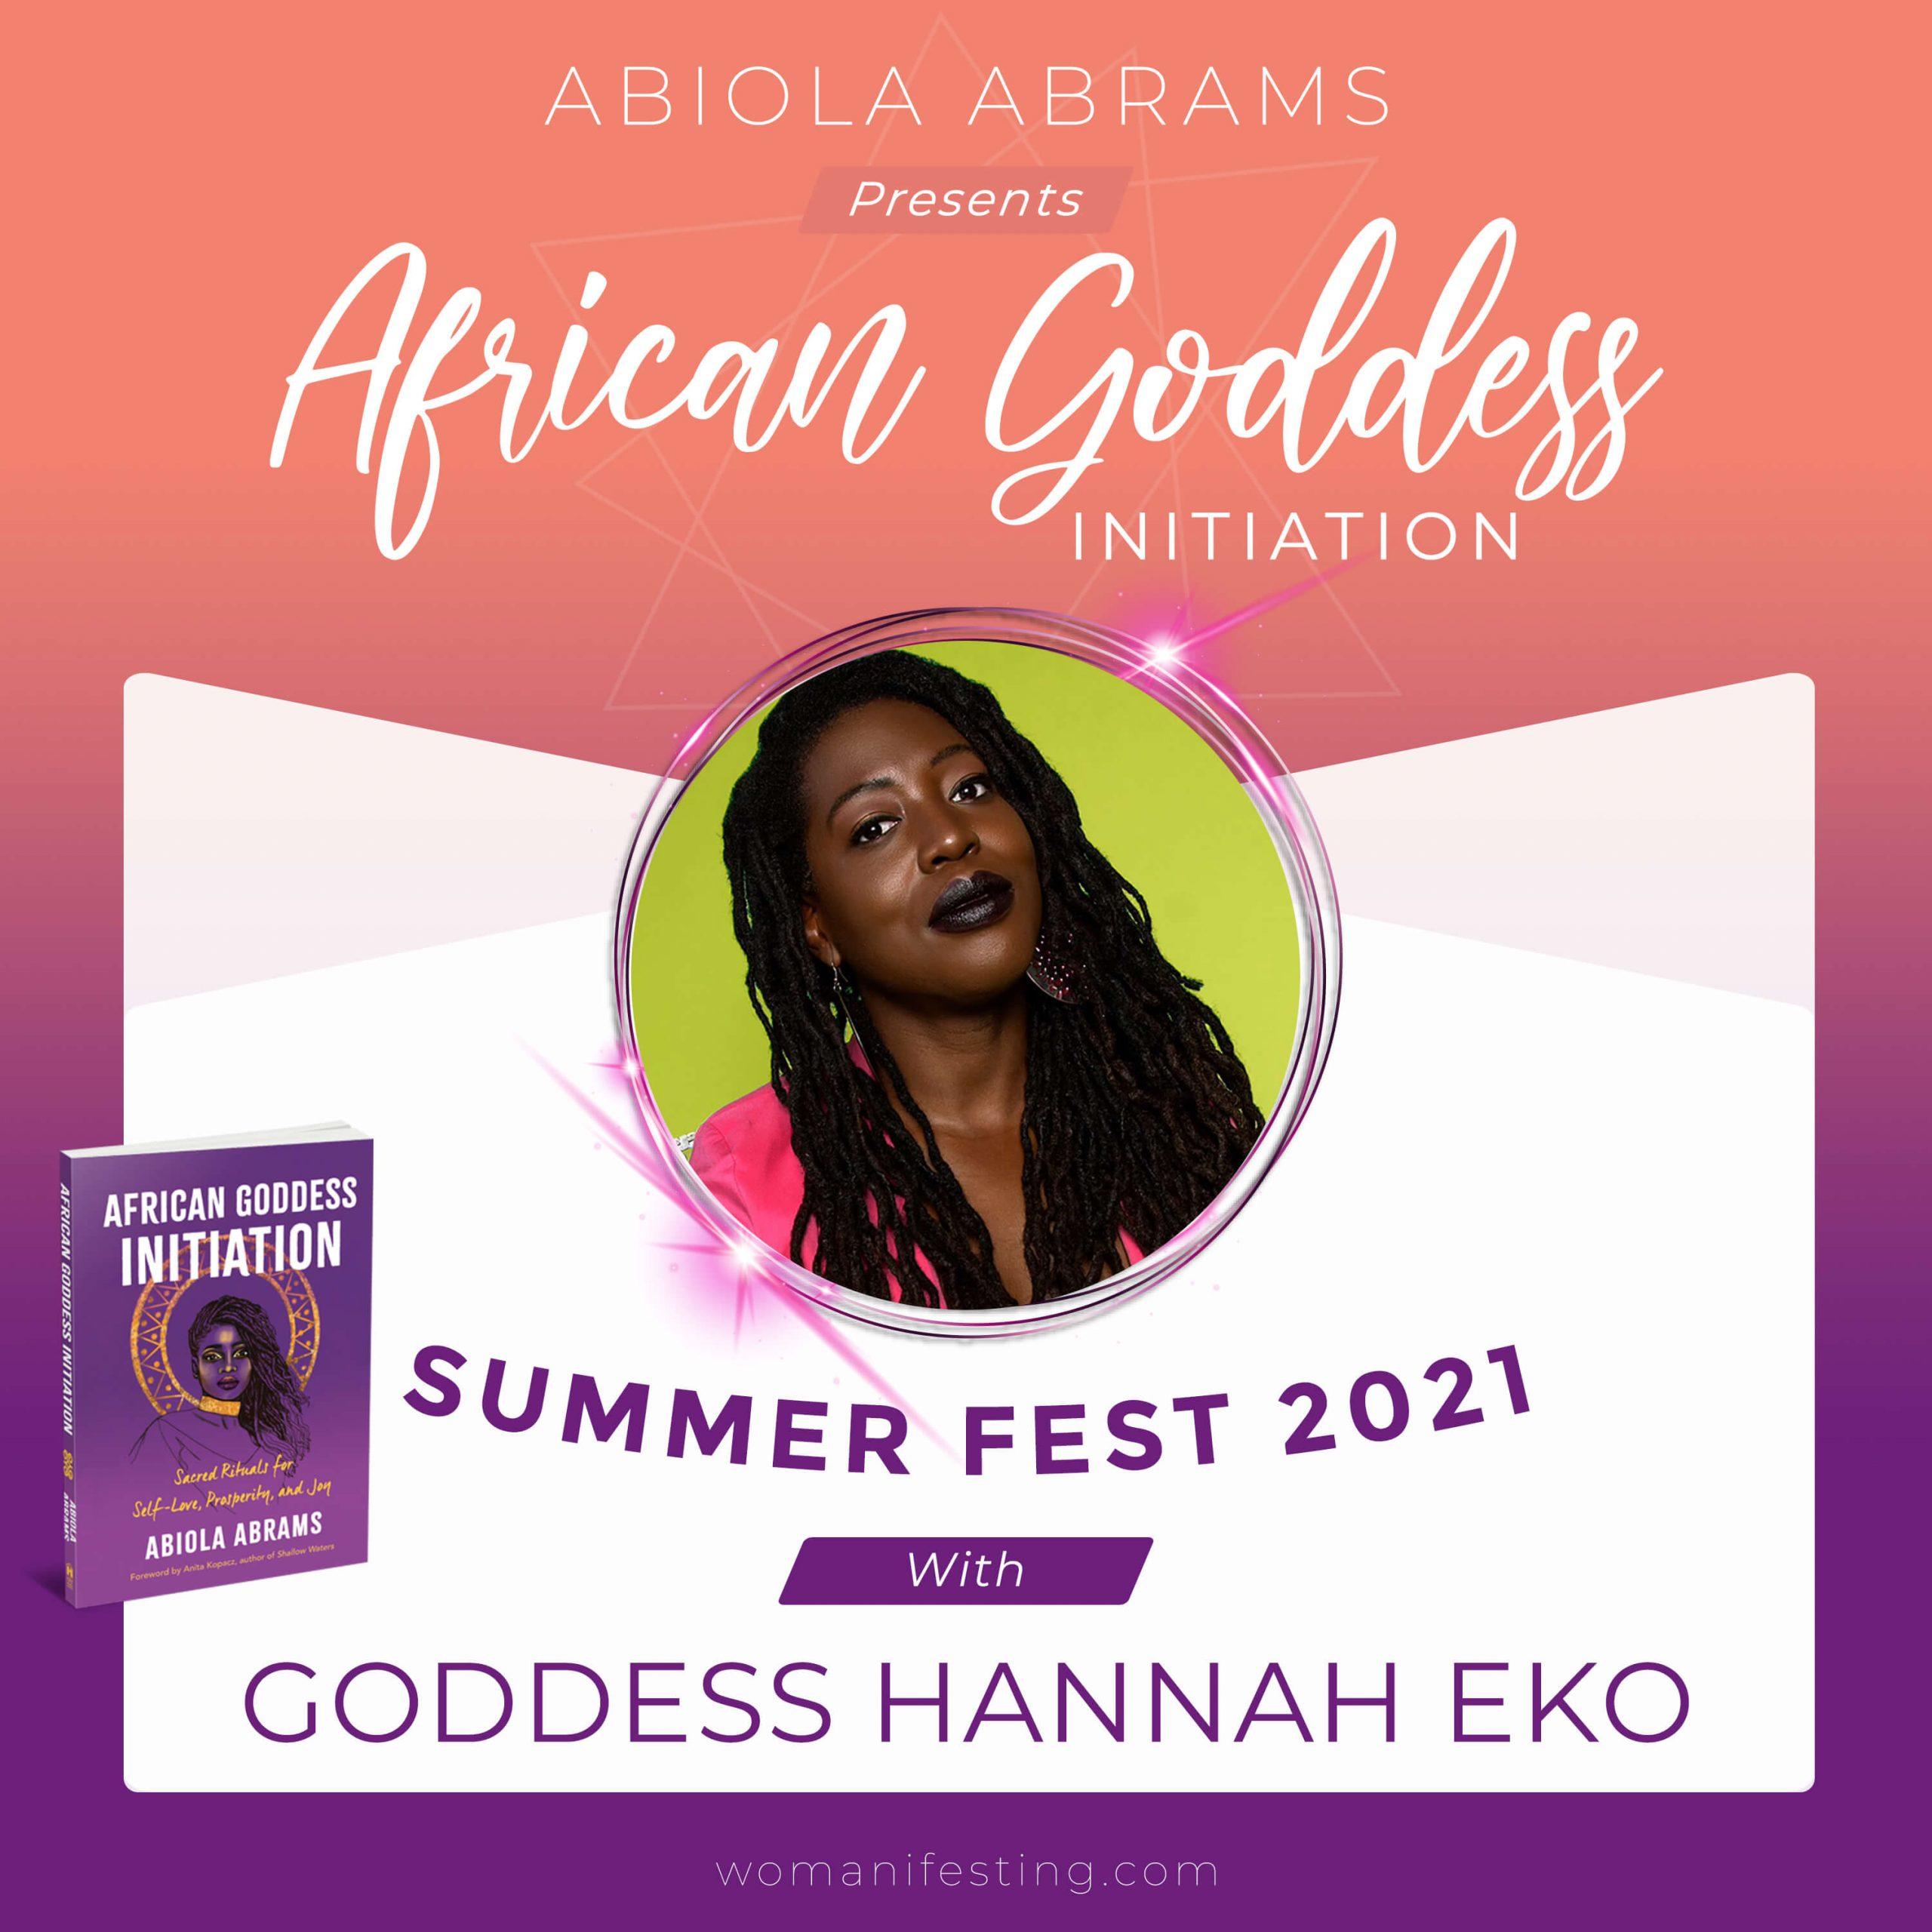 Goddess Hannah Eko: African Goddess Initiation Fest Guru